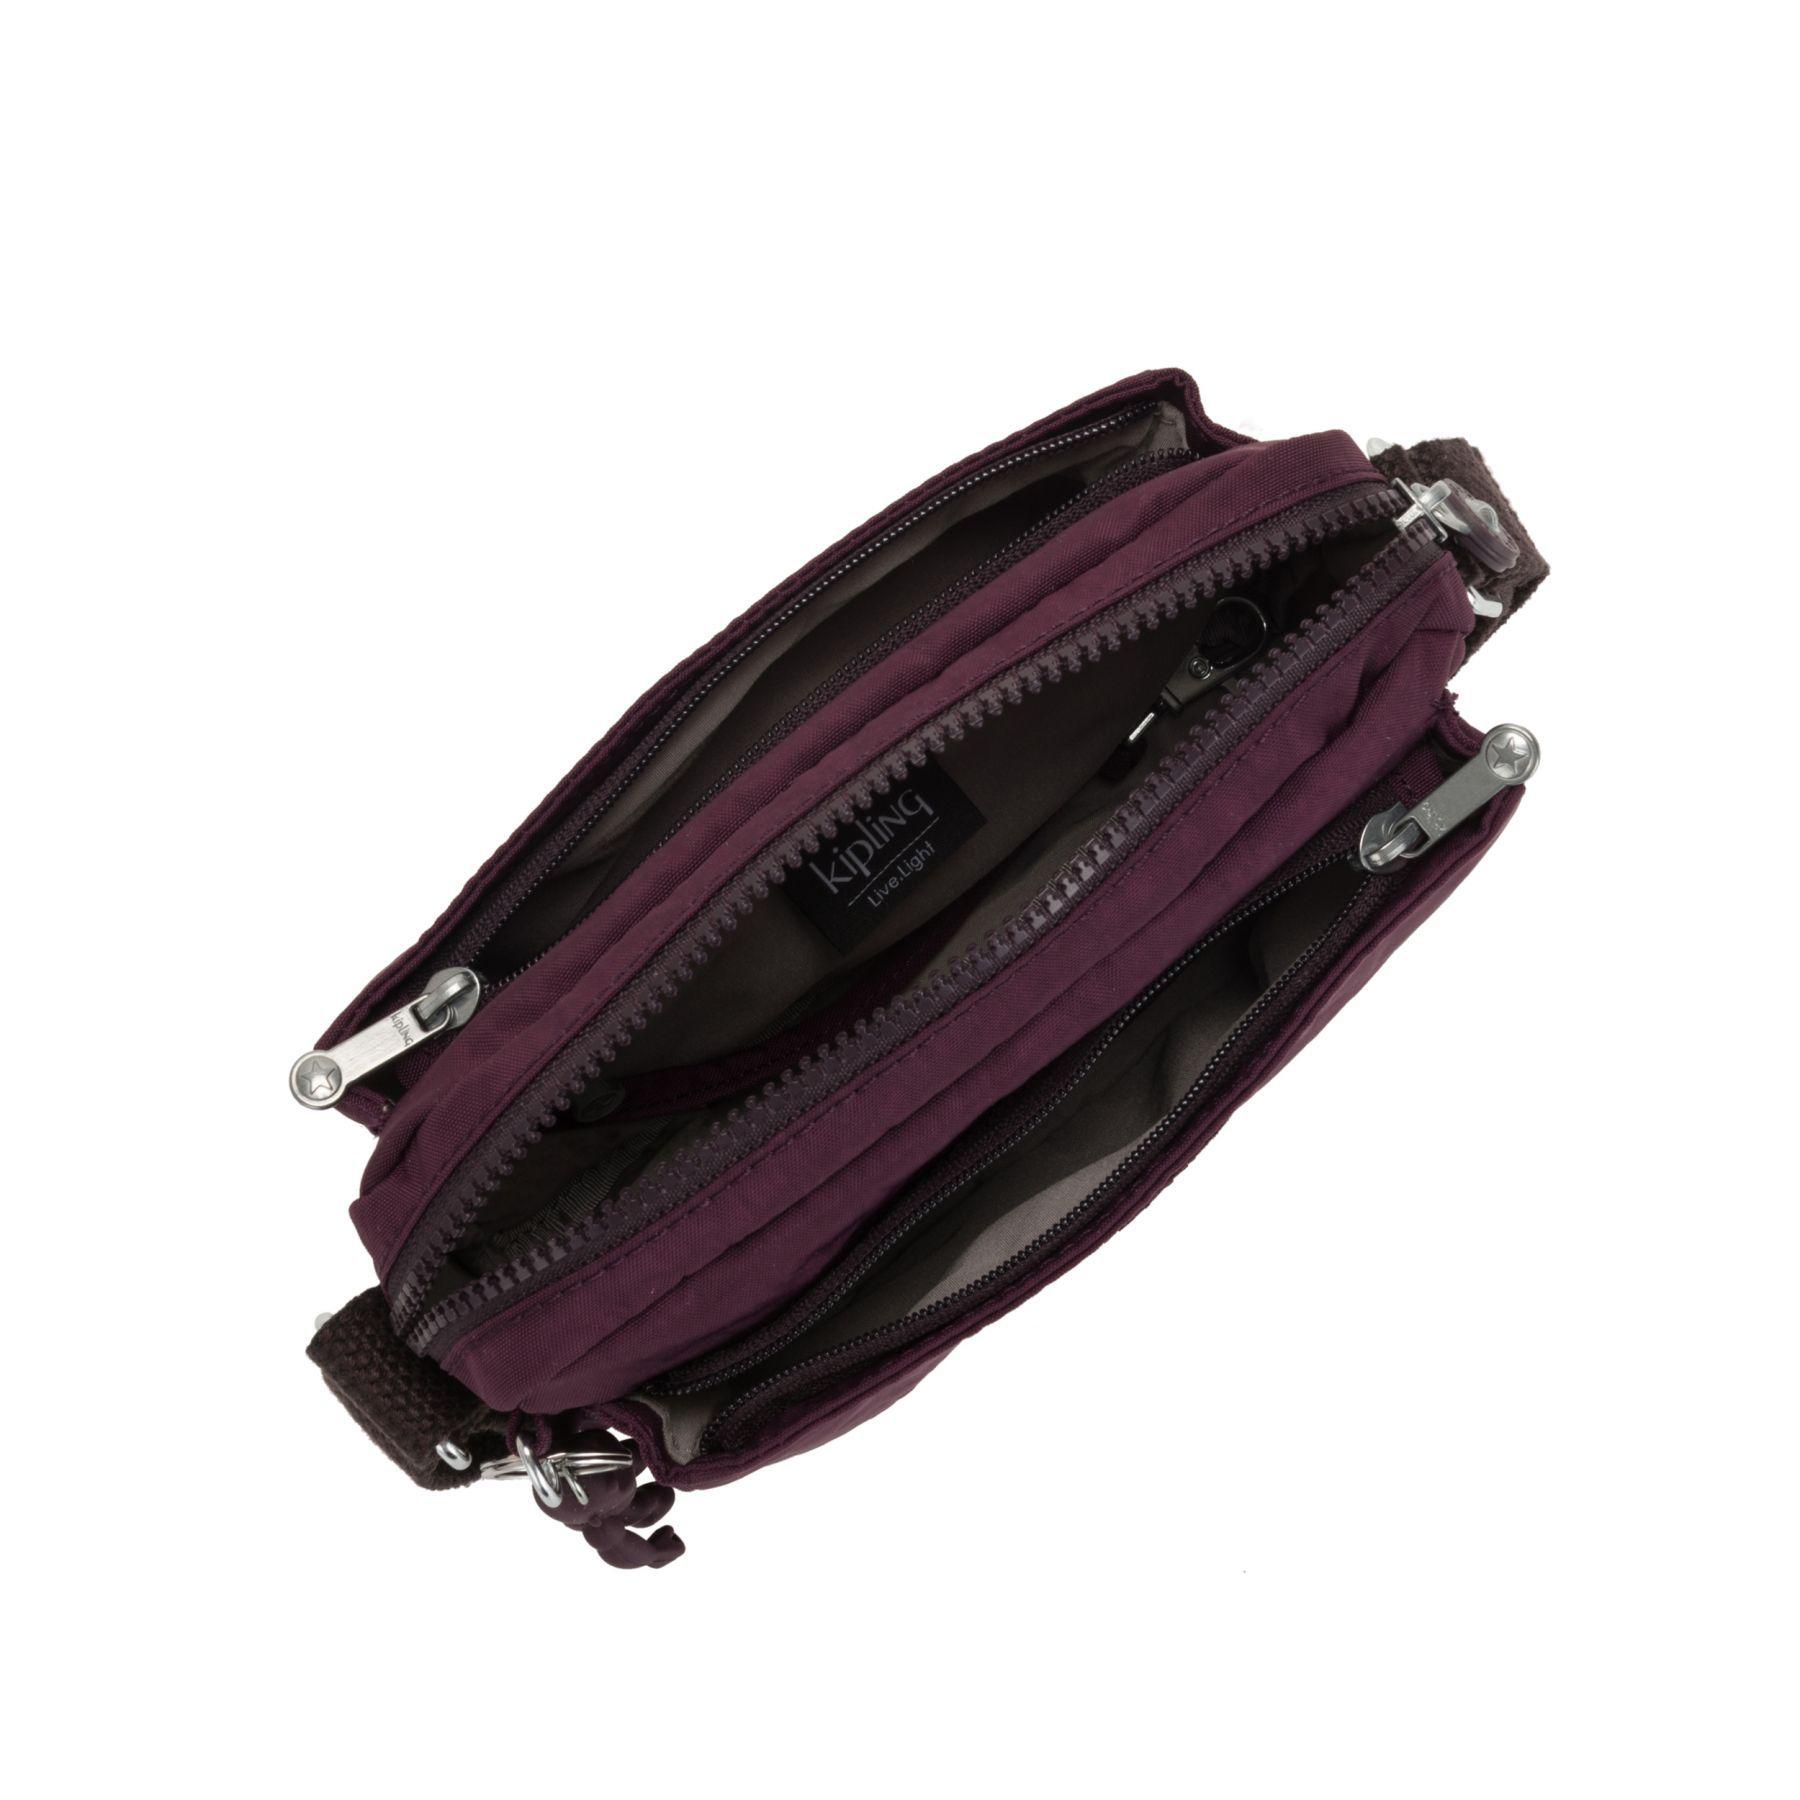 Bolsa Pequena Transversal Kipling Abanu Dark Plum